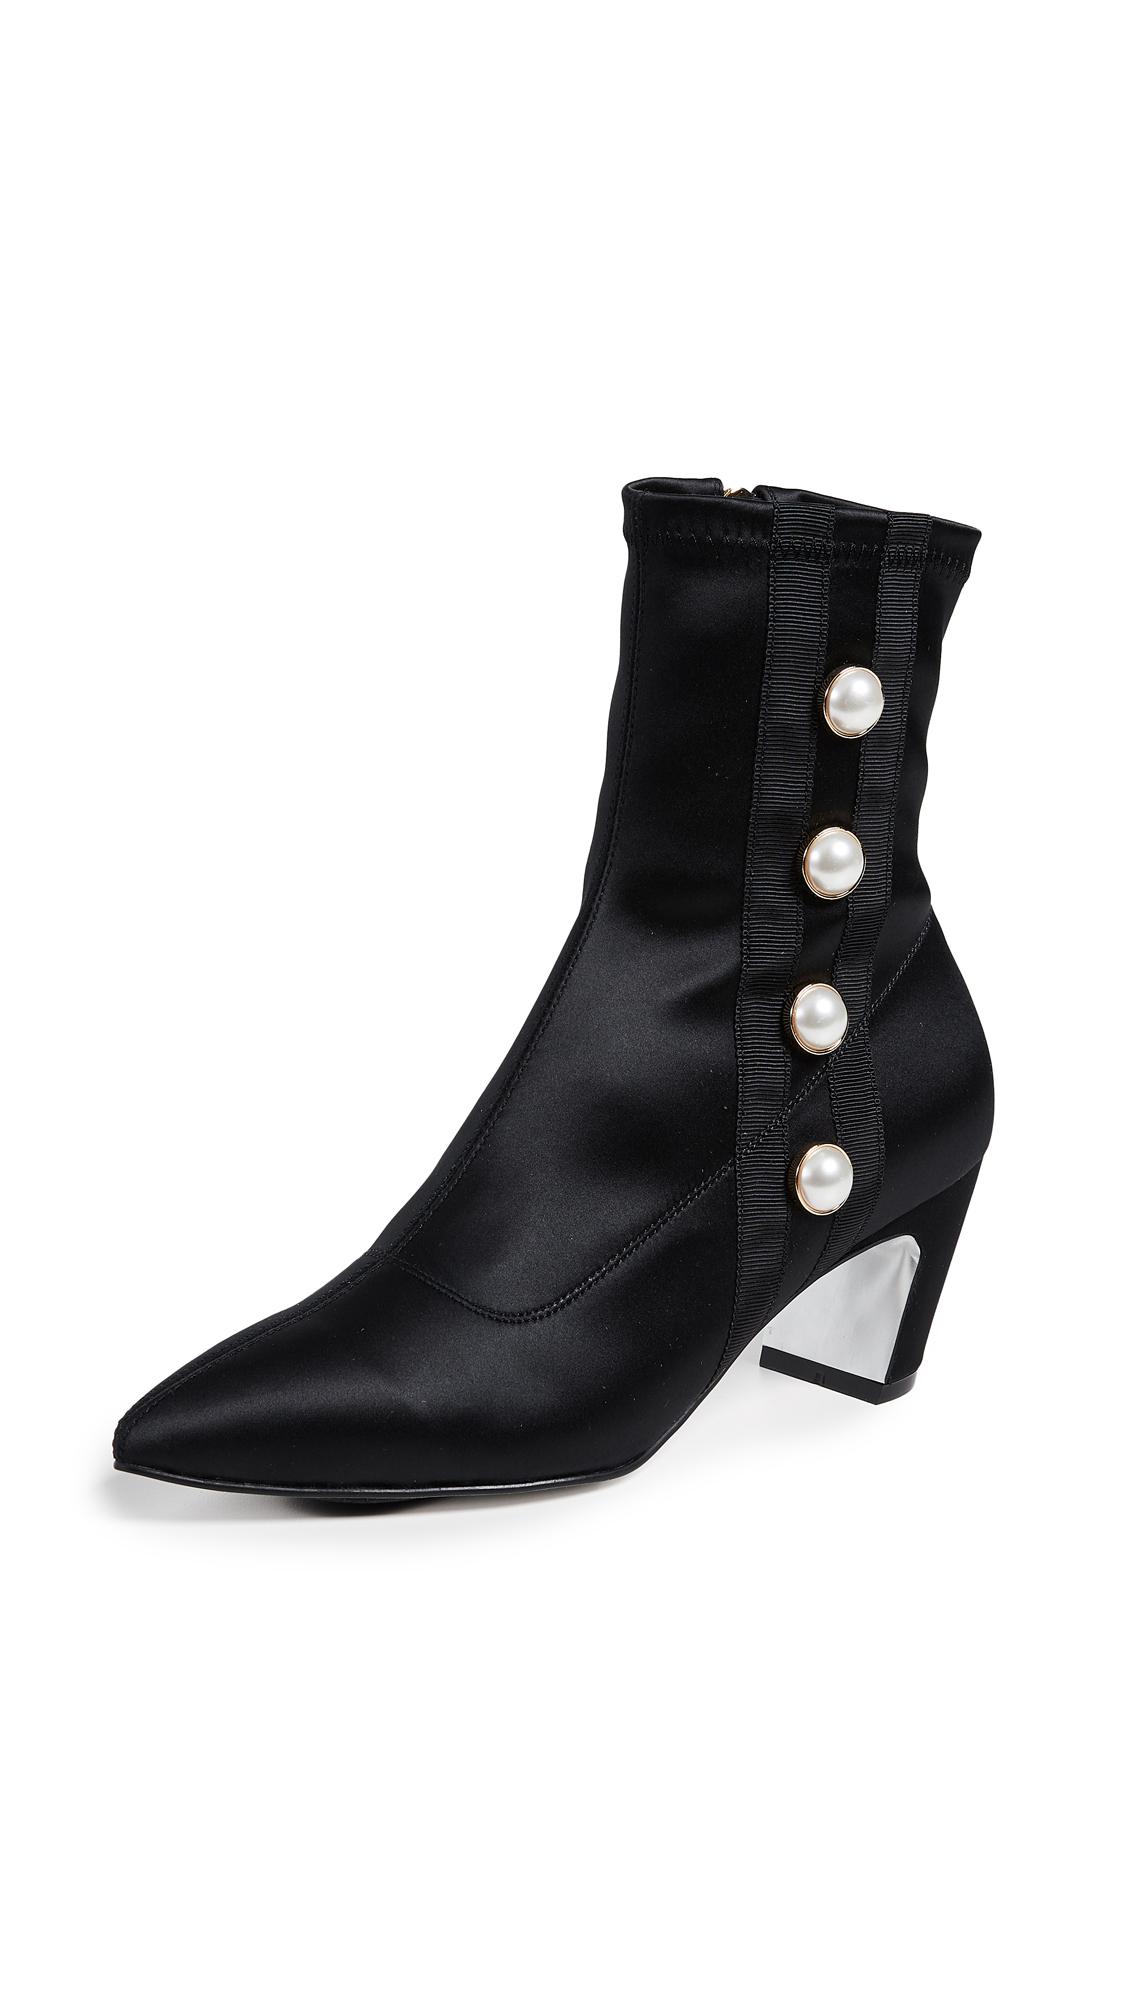 Suecomma Bonnie Pearl Ankle Boots - Black